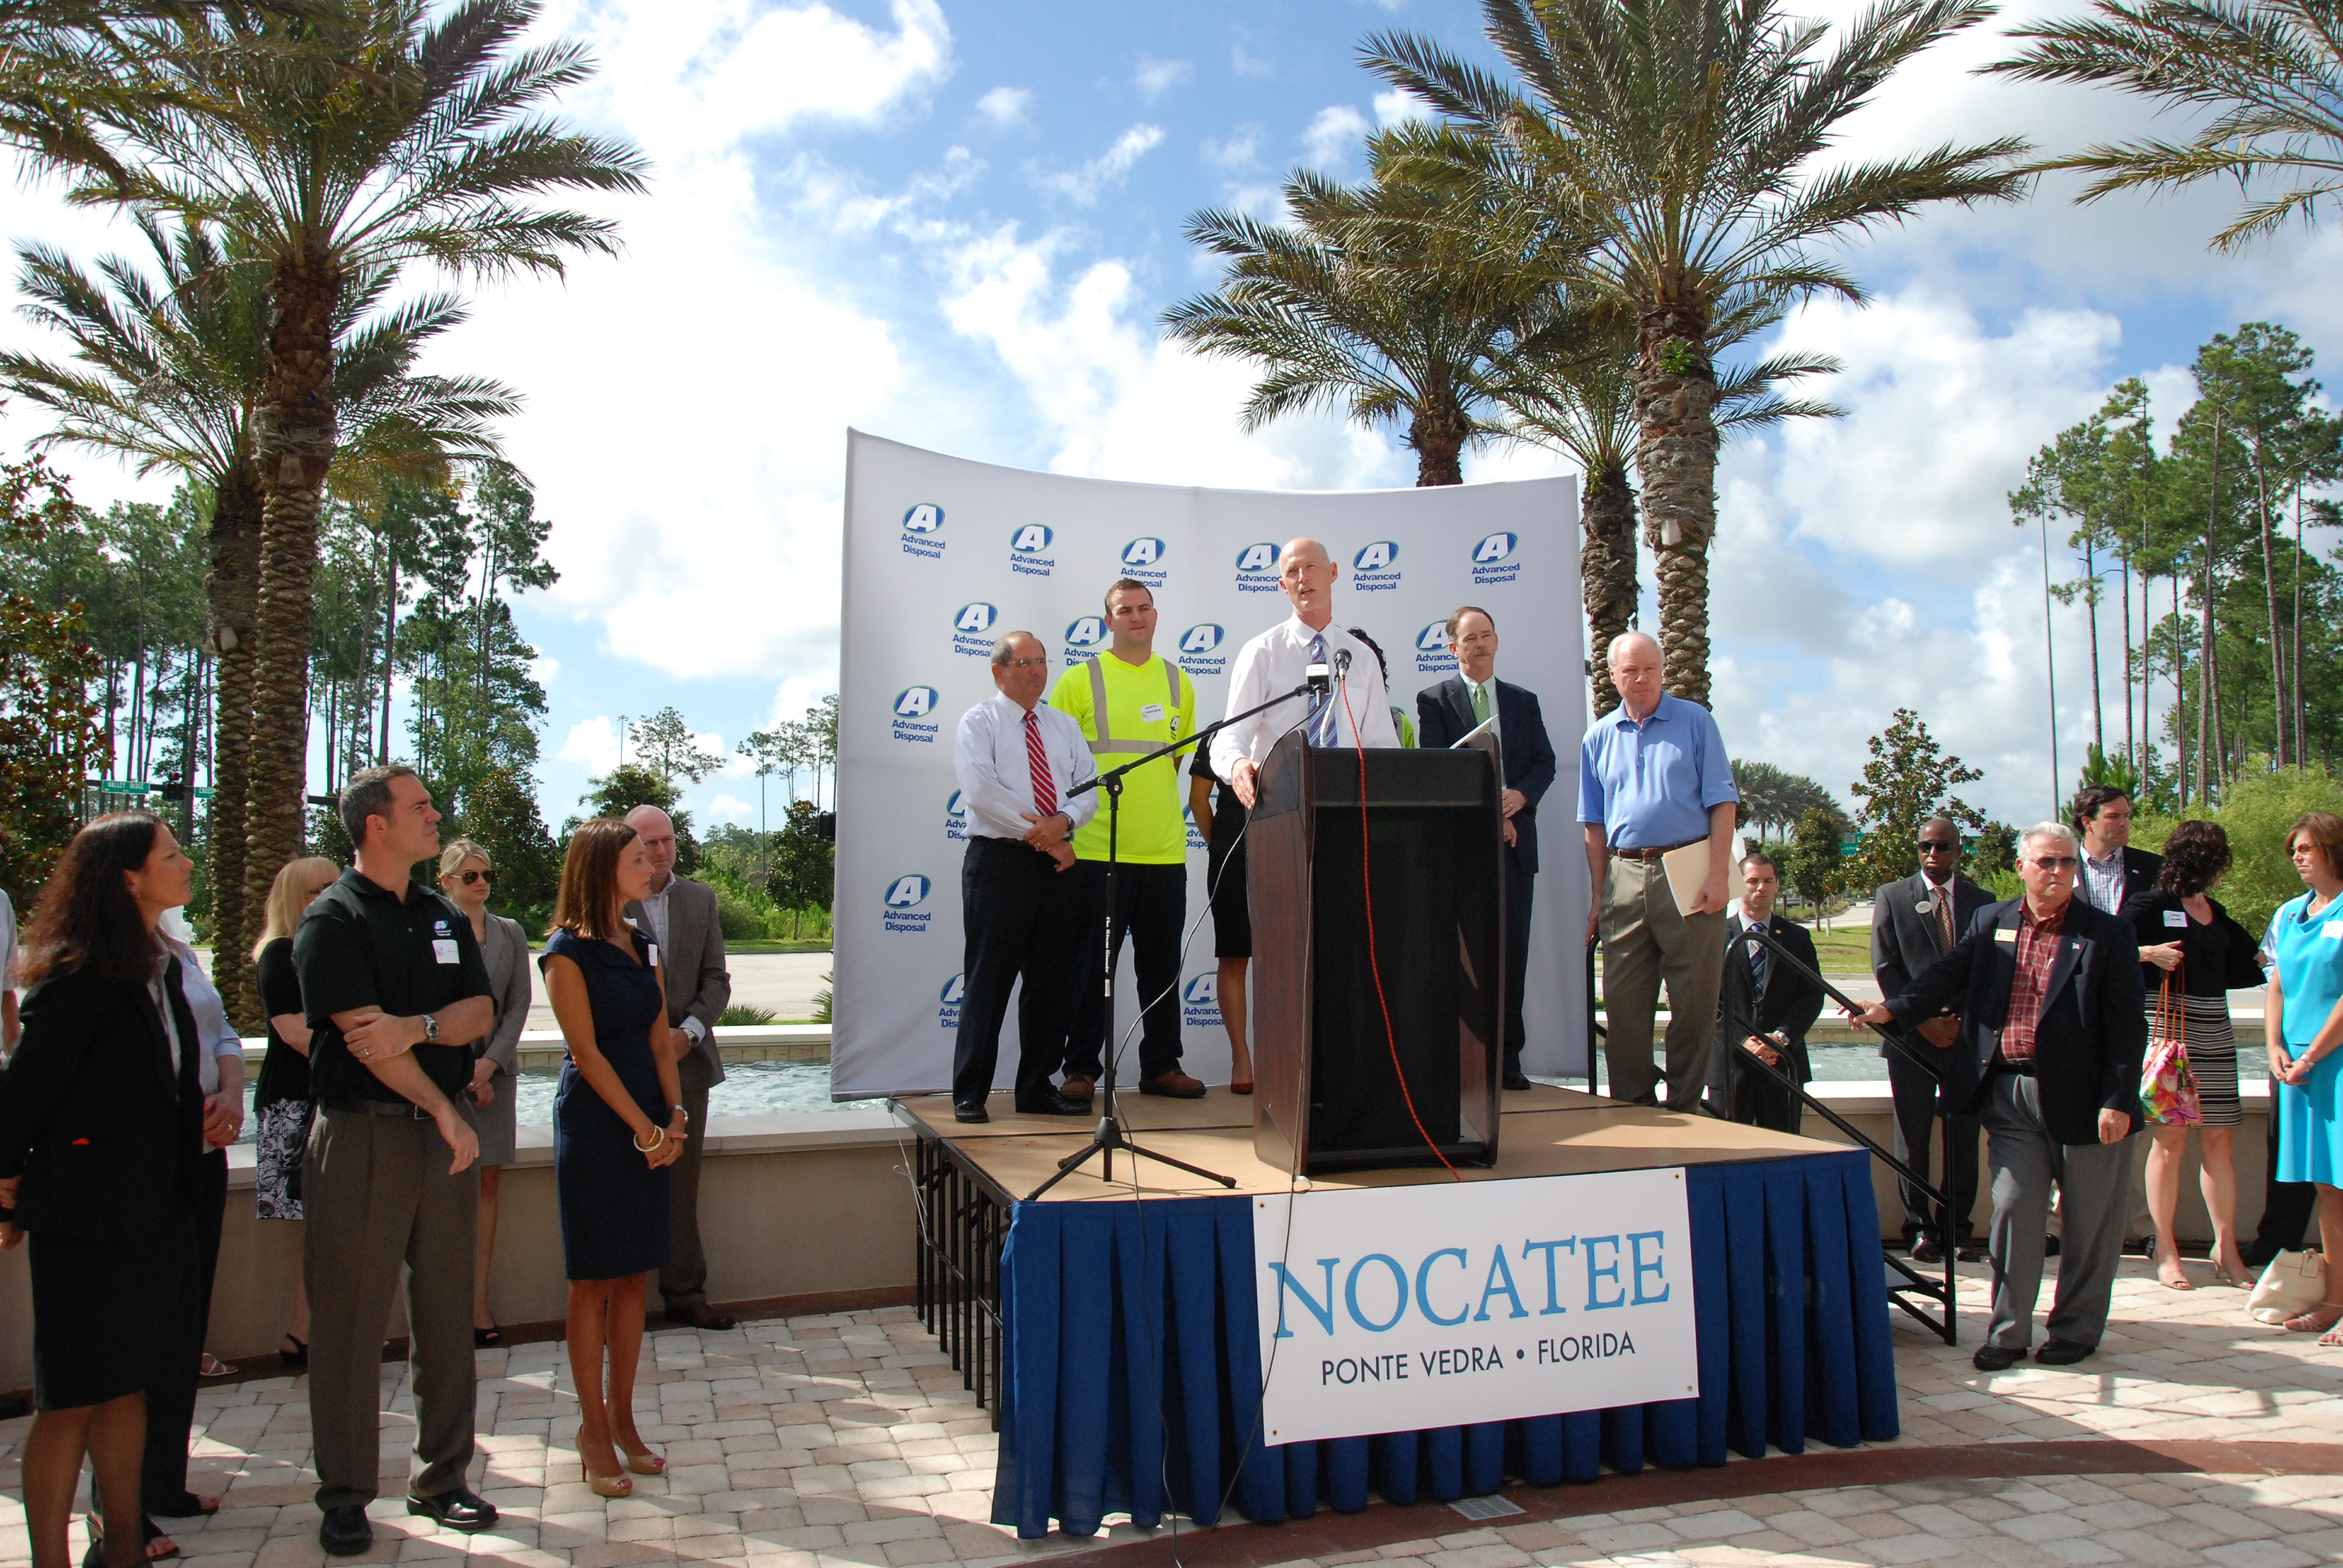 Governor Rick Scott at Nocatee